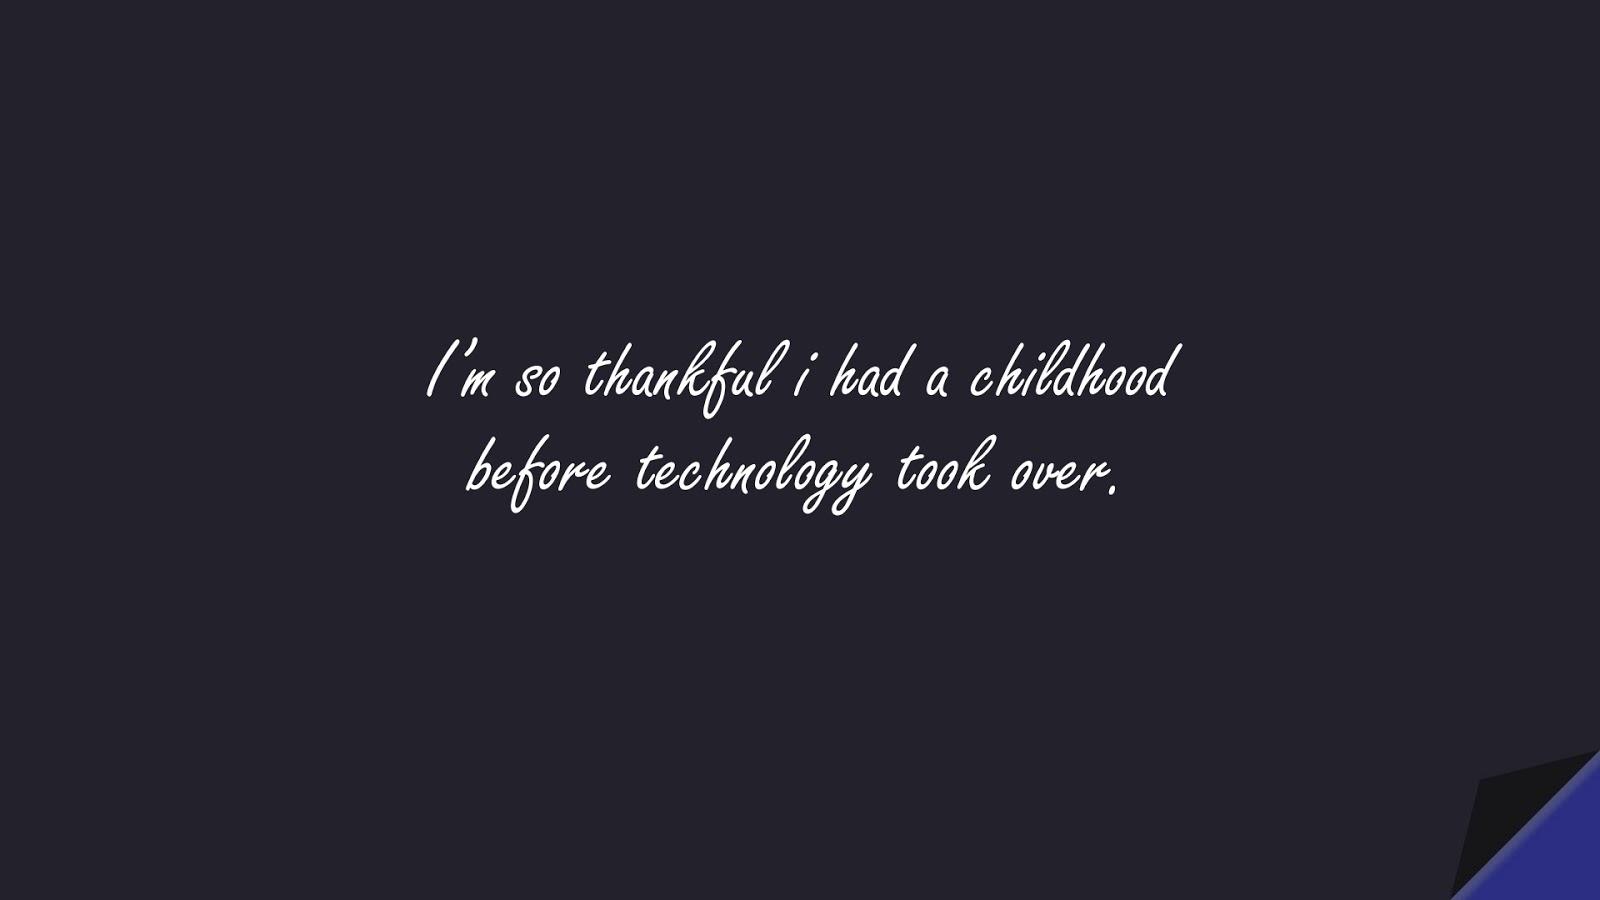 I'm so thankful i had a childhood before technology took over.FALSE